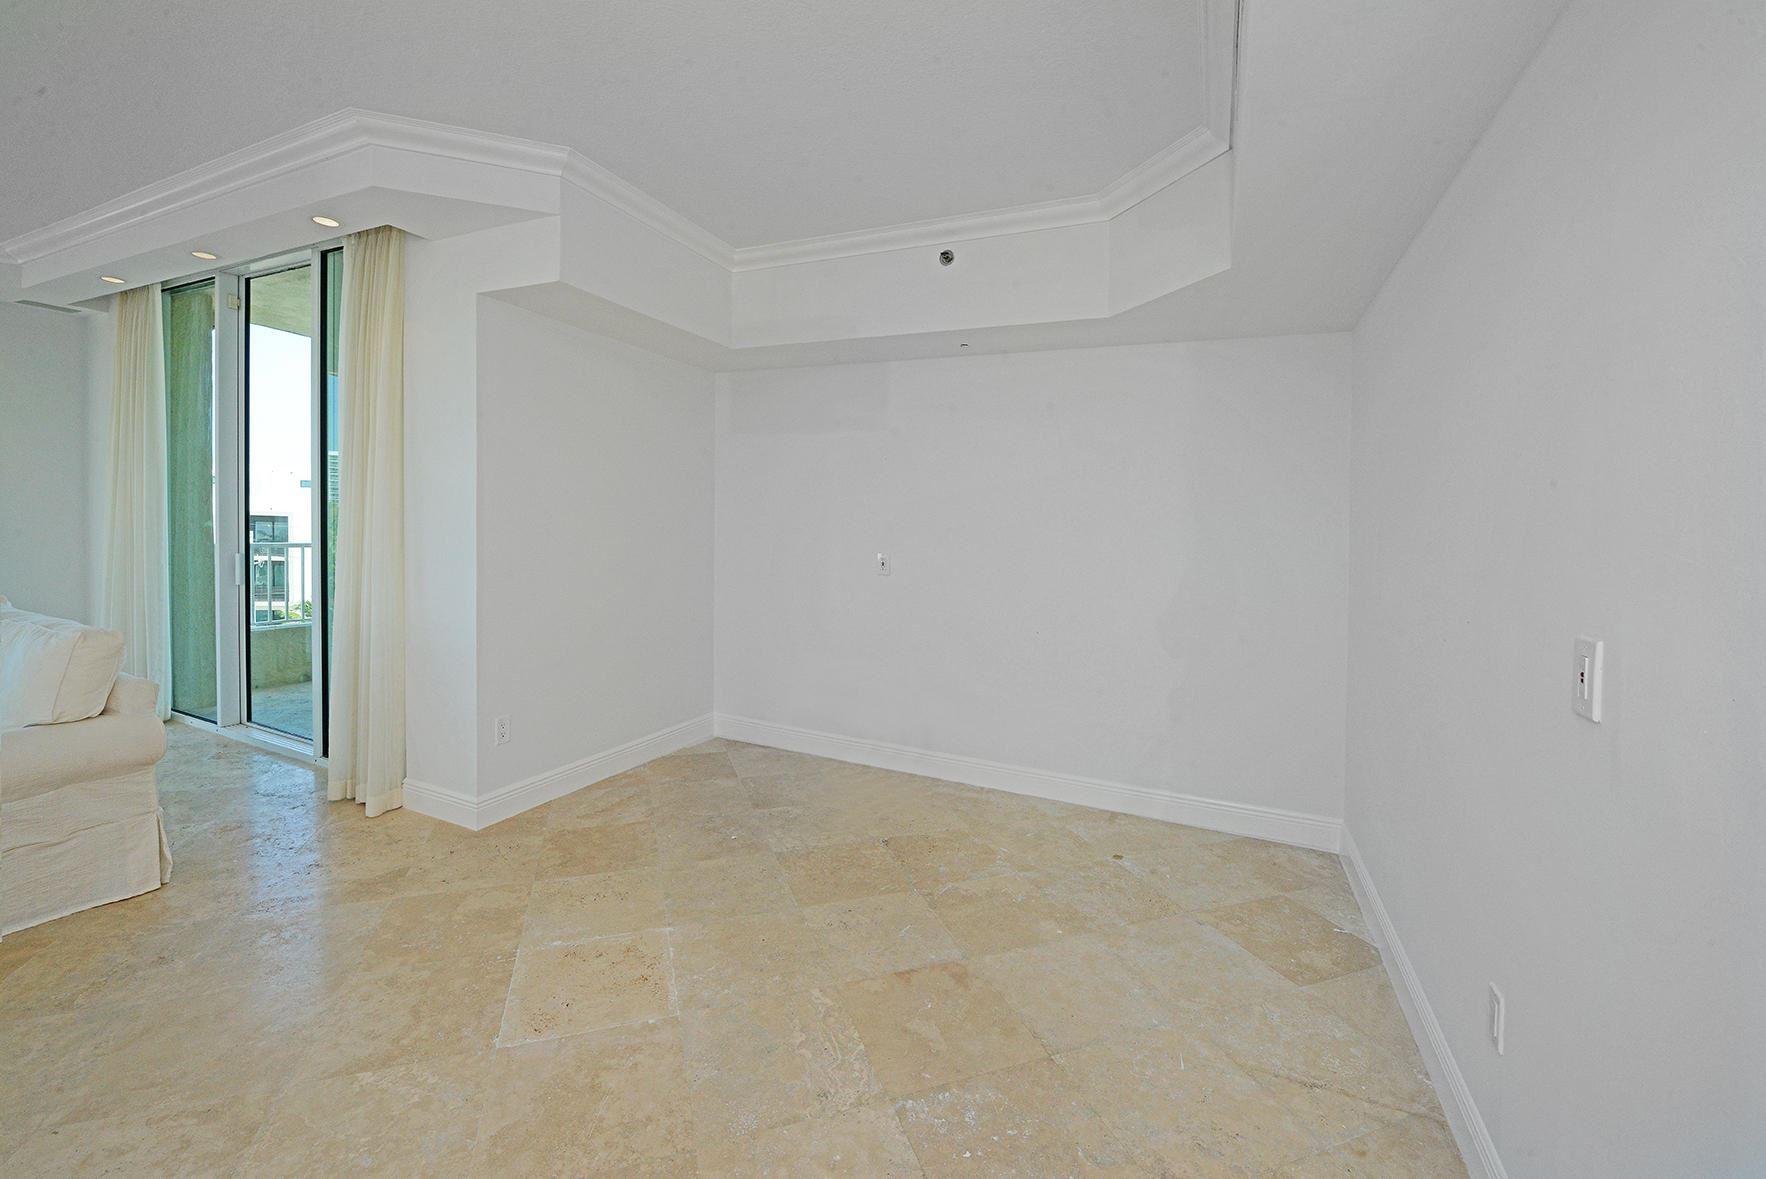 3700 Ocean, Highland Beach, FL, 33487, TOSCANA NORTH TOWER I Home For Sale